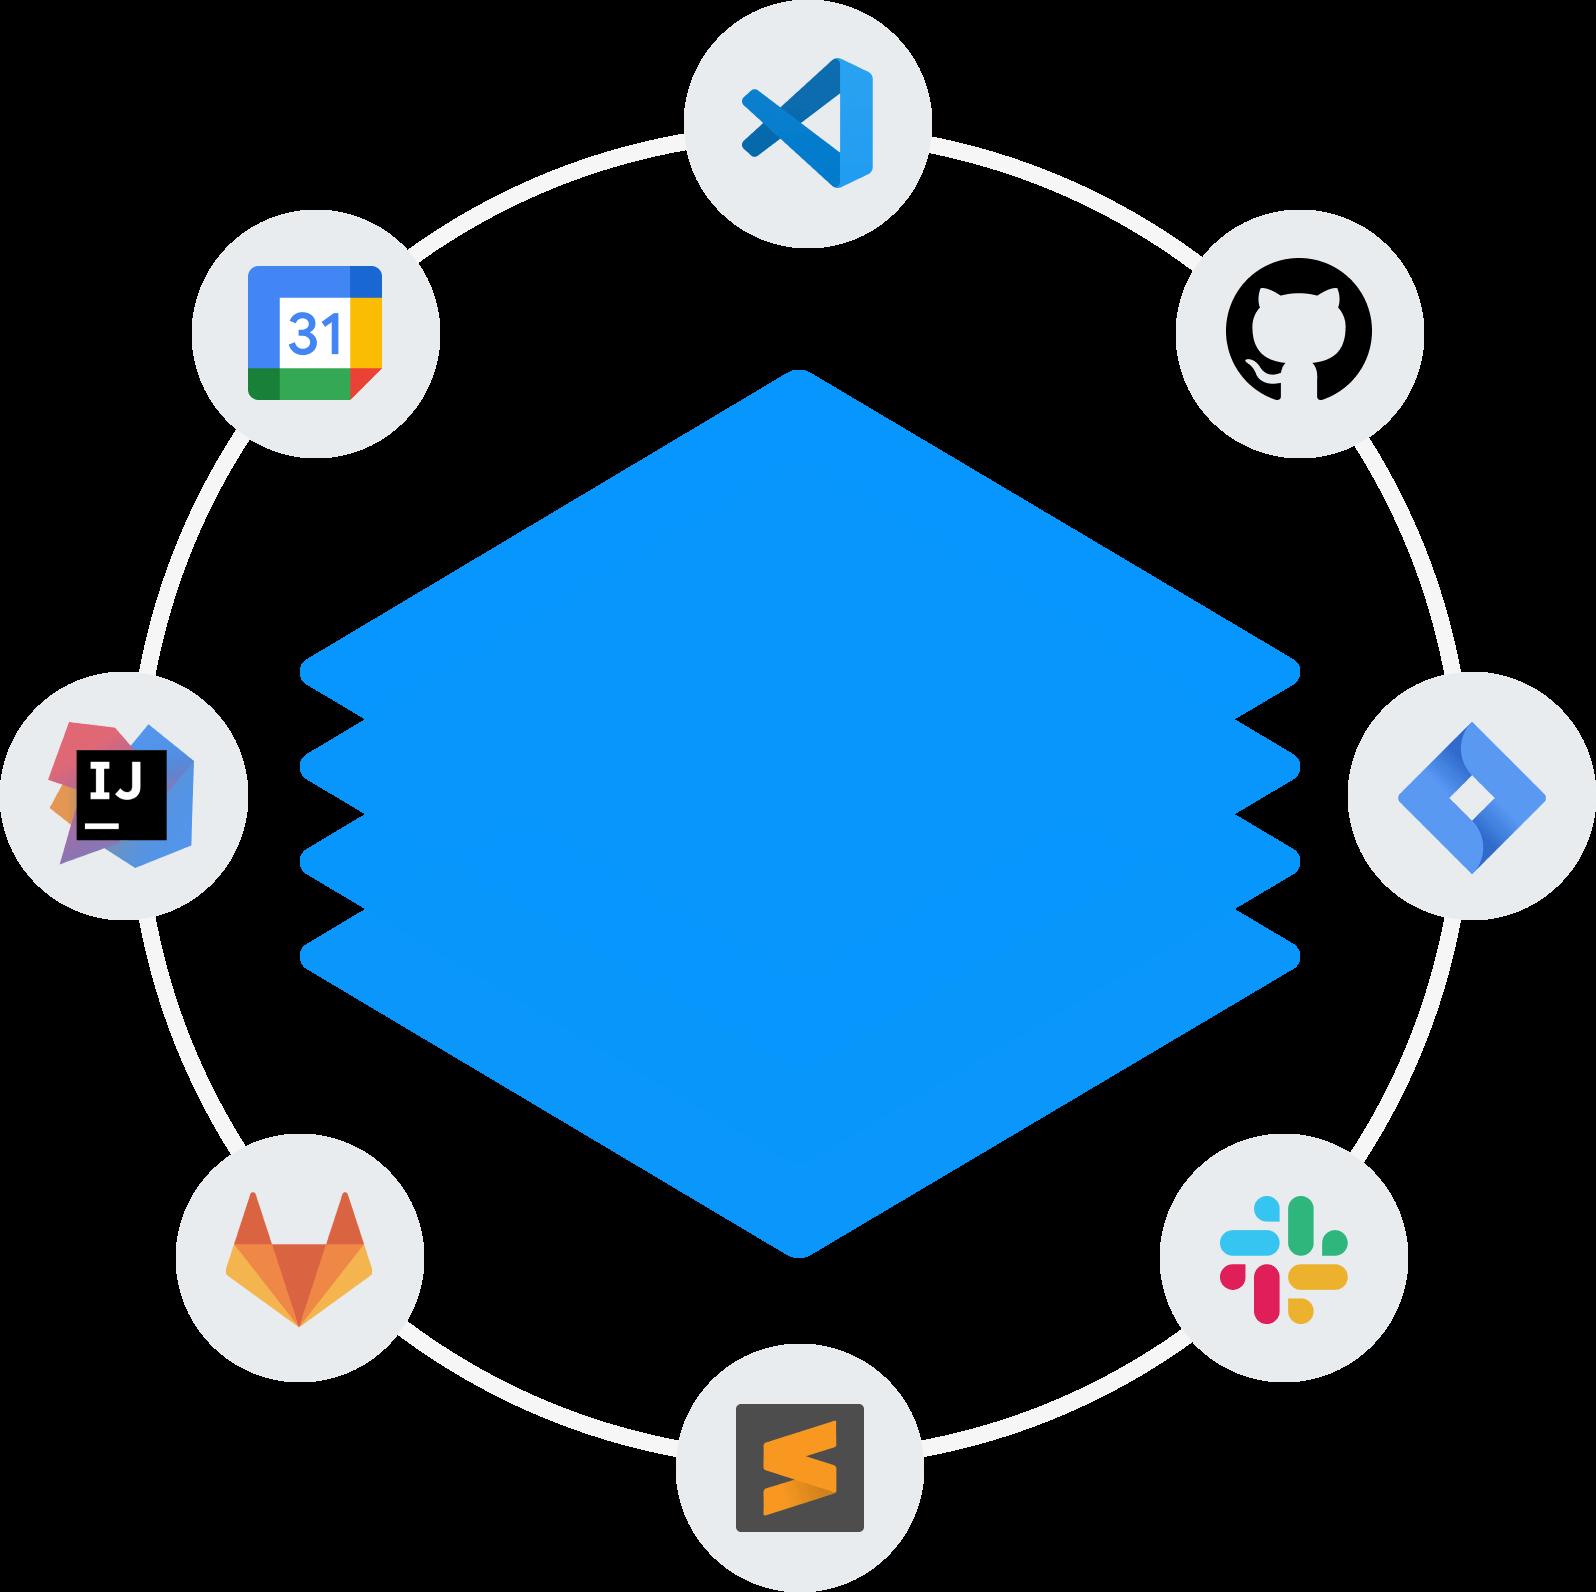 Software development tool stack